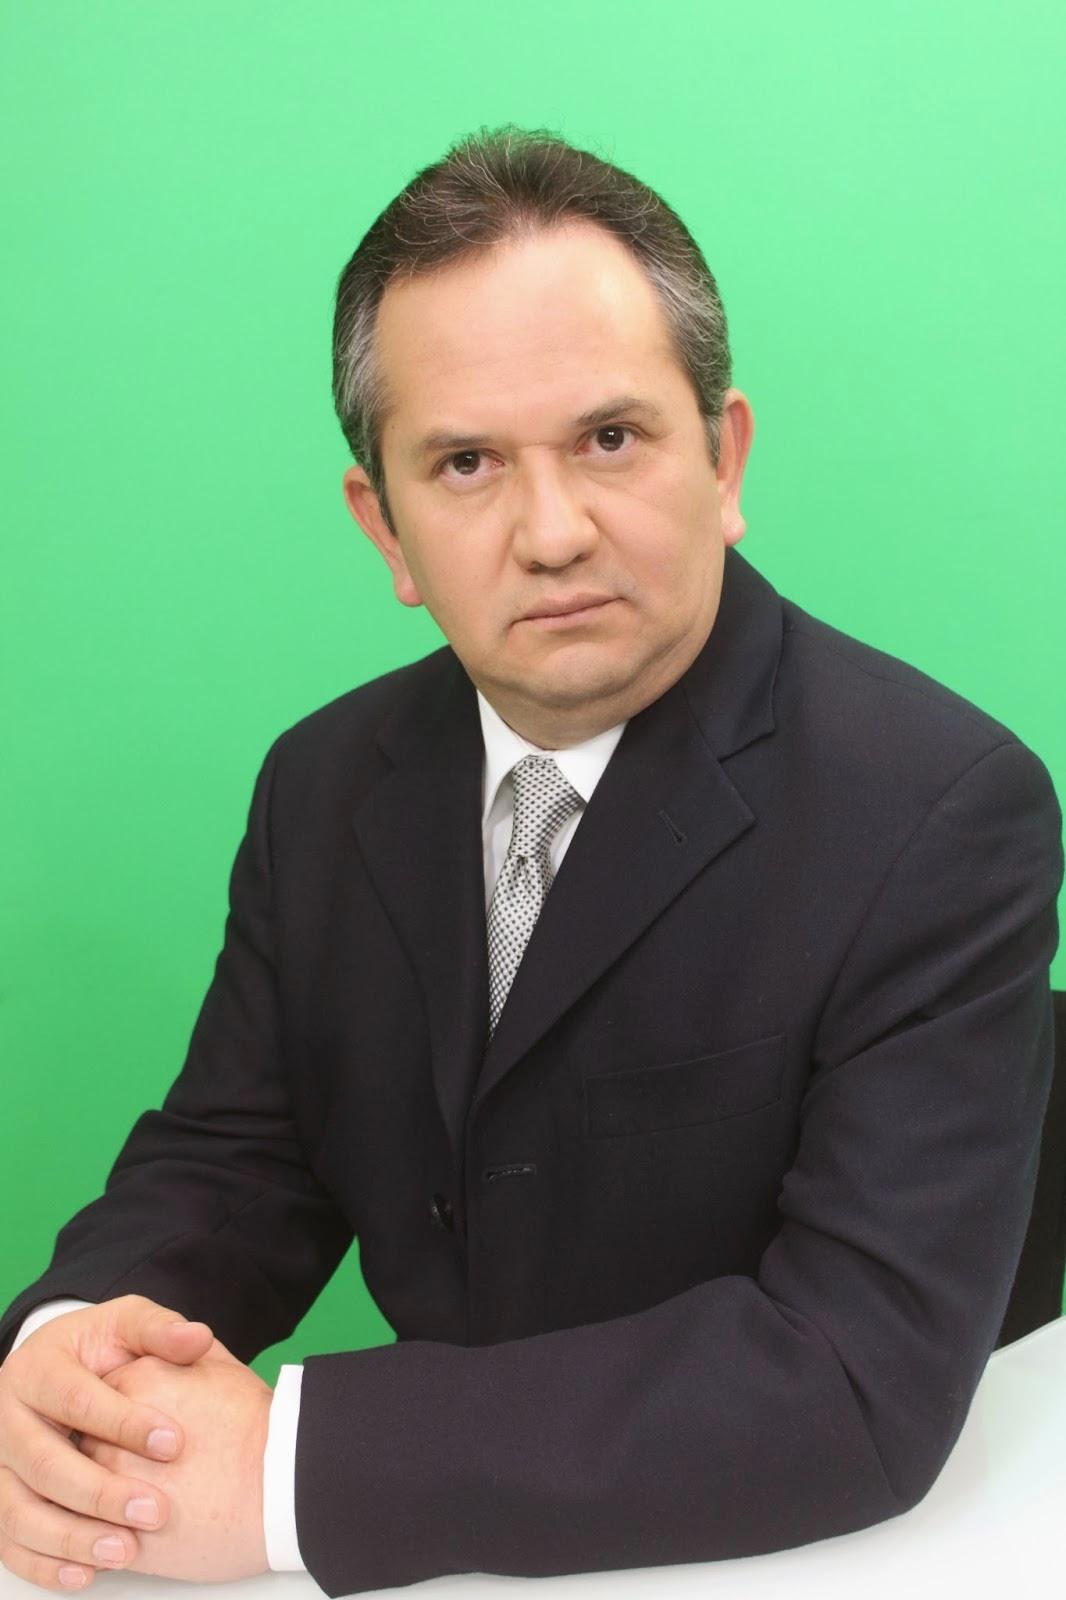 Cicuta Jaime Flores Martínez